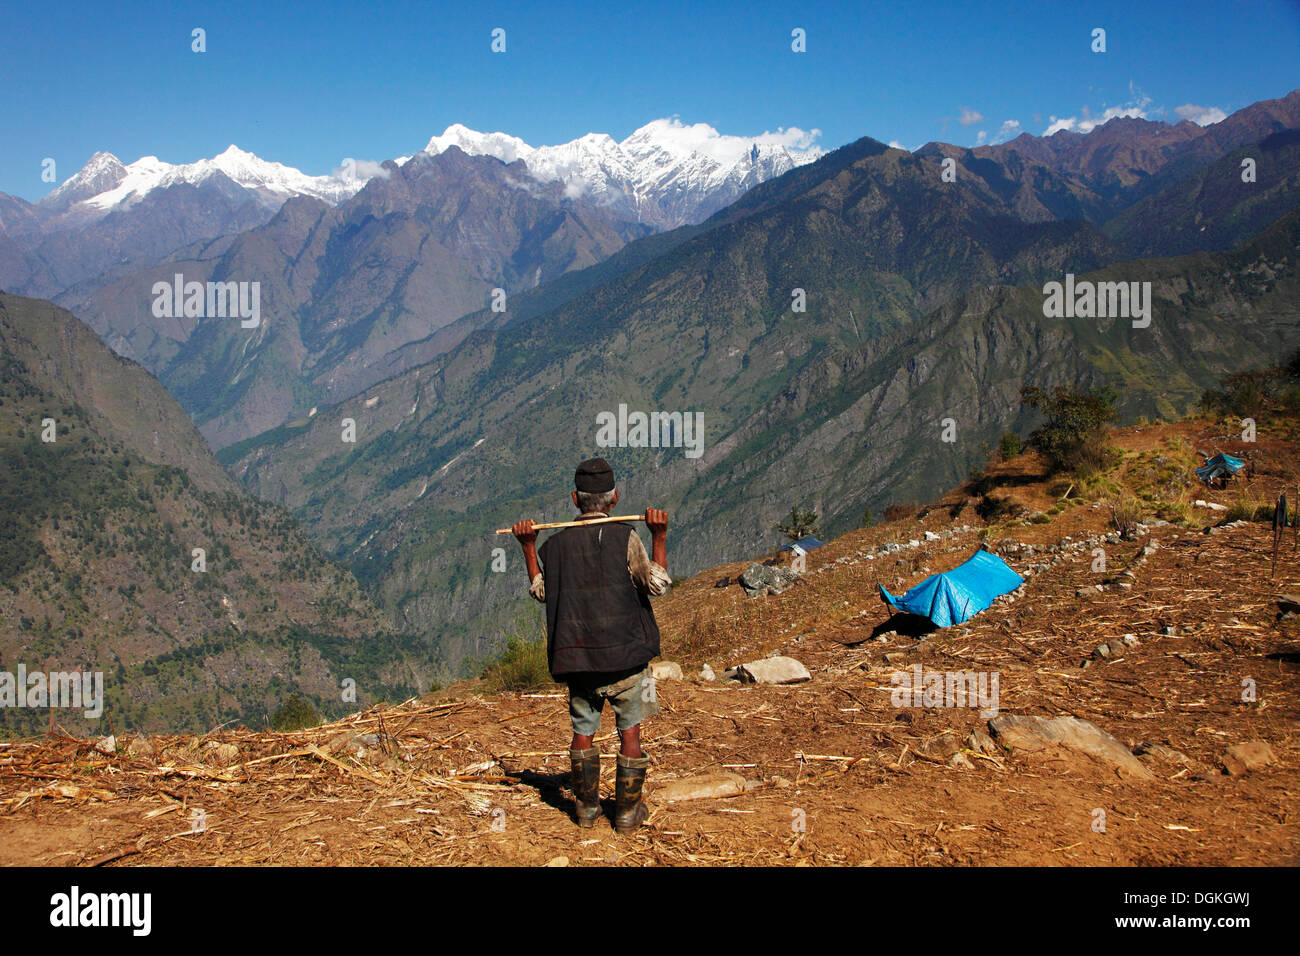 A view over Ganesh Himal and the Himalayas. - Stock Image